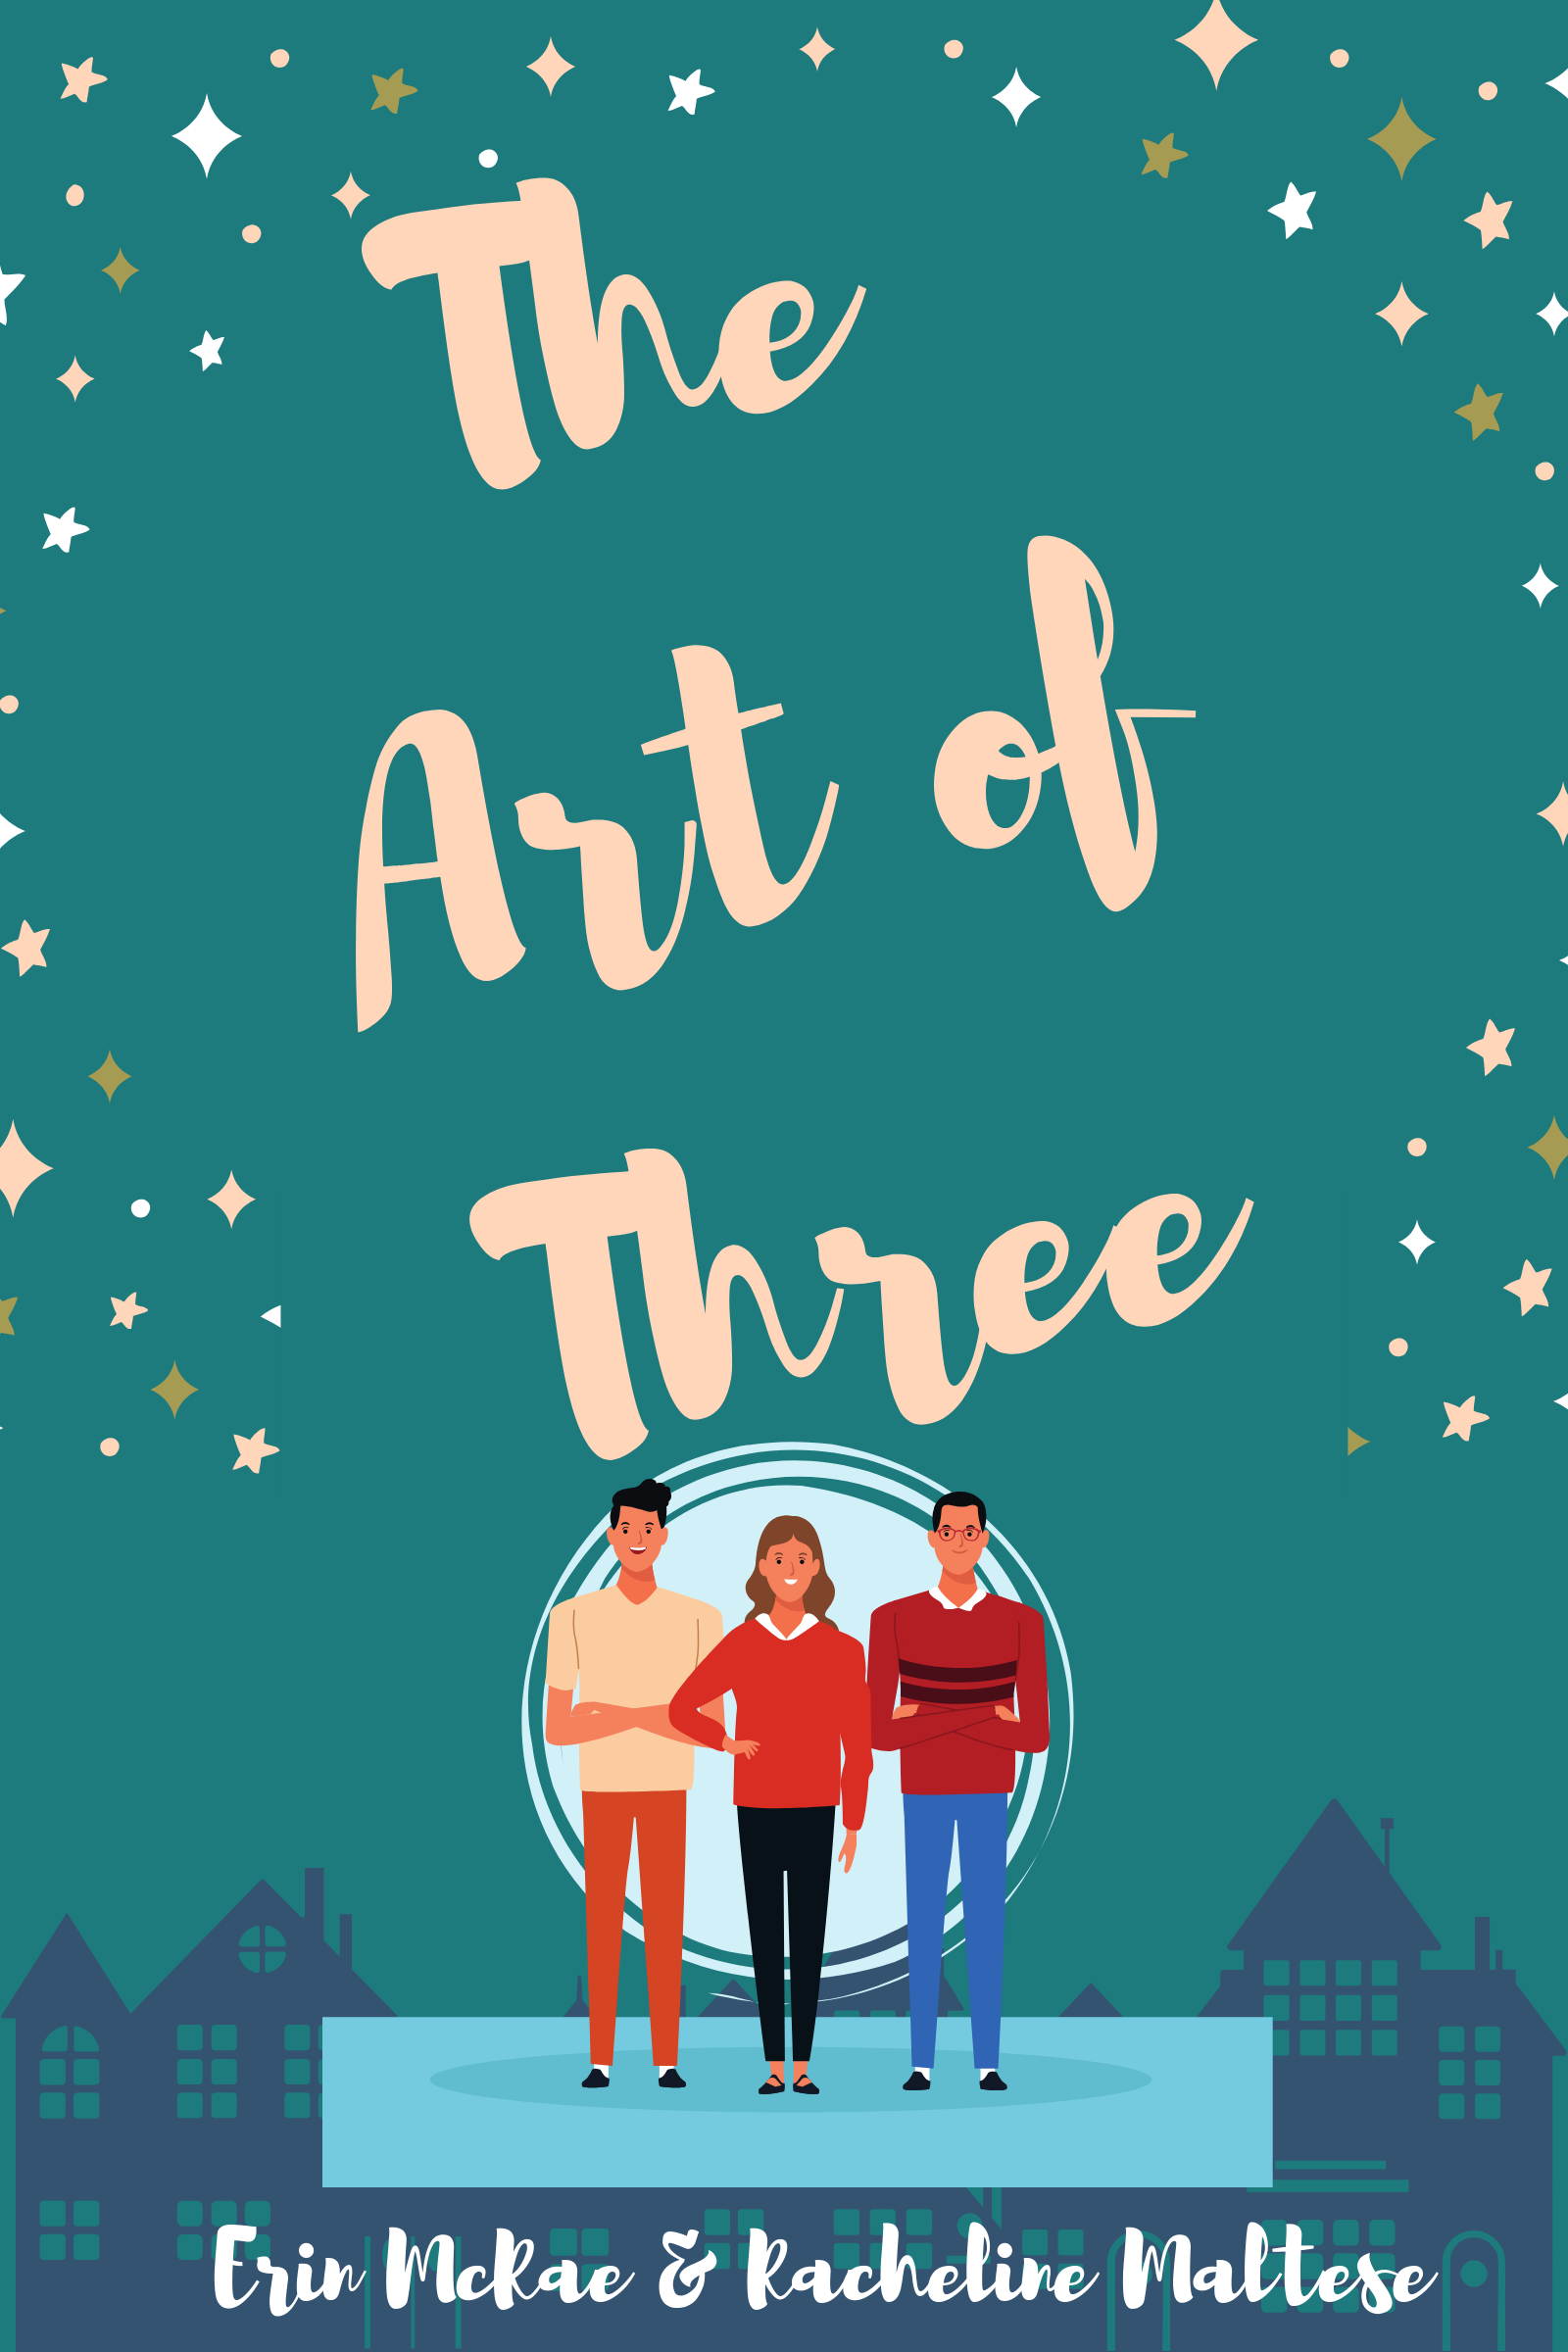 The Art of Three